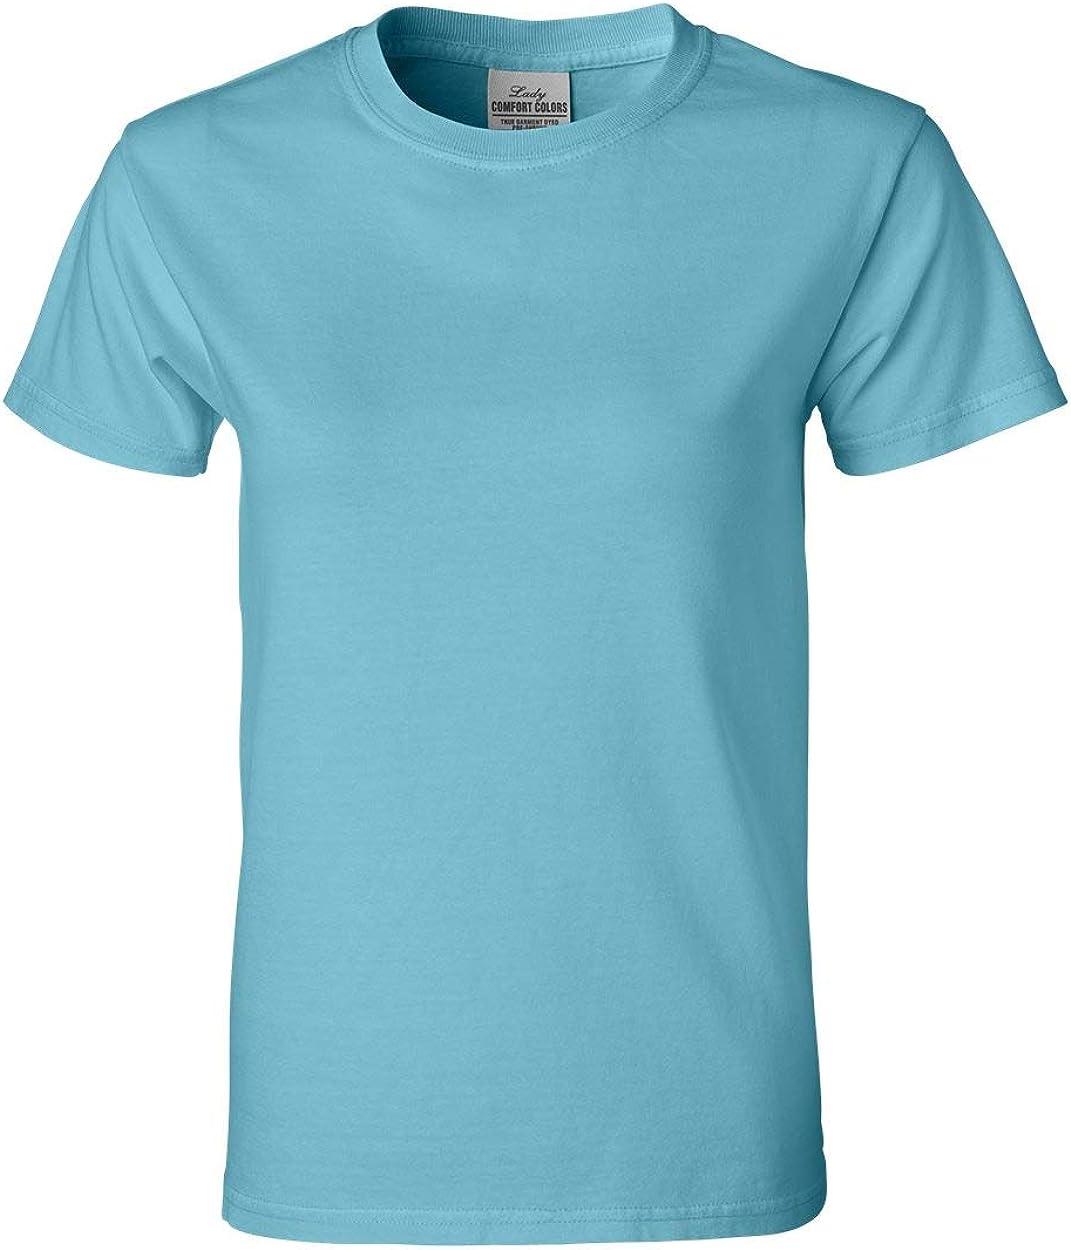 De Poméranie C-neuf coton gris col V T-Shirt